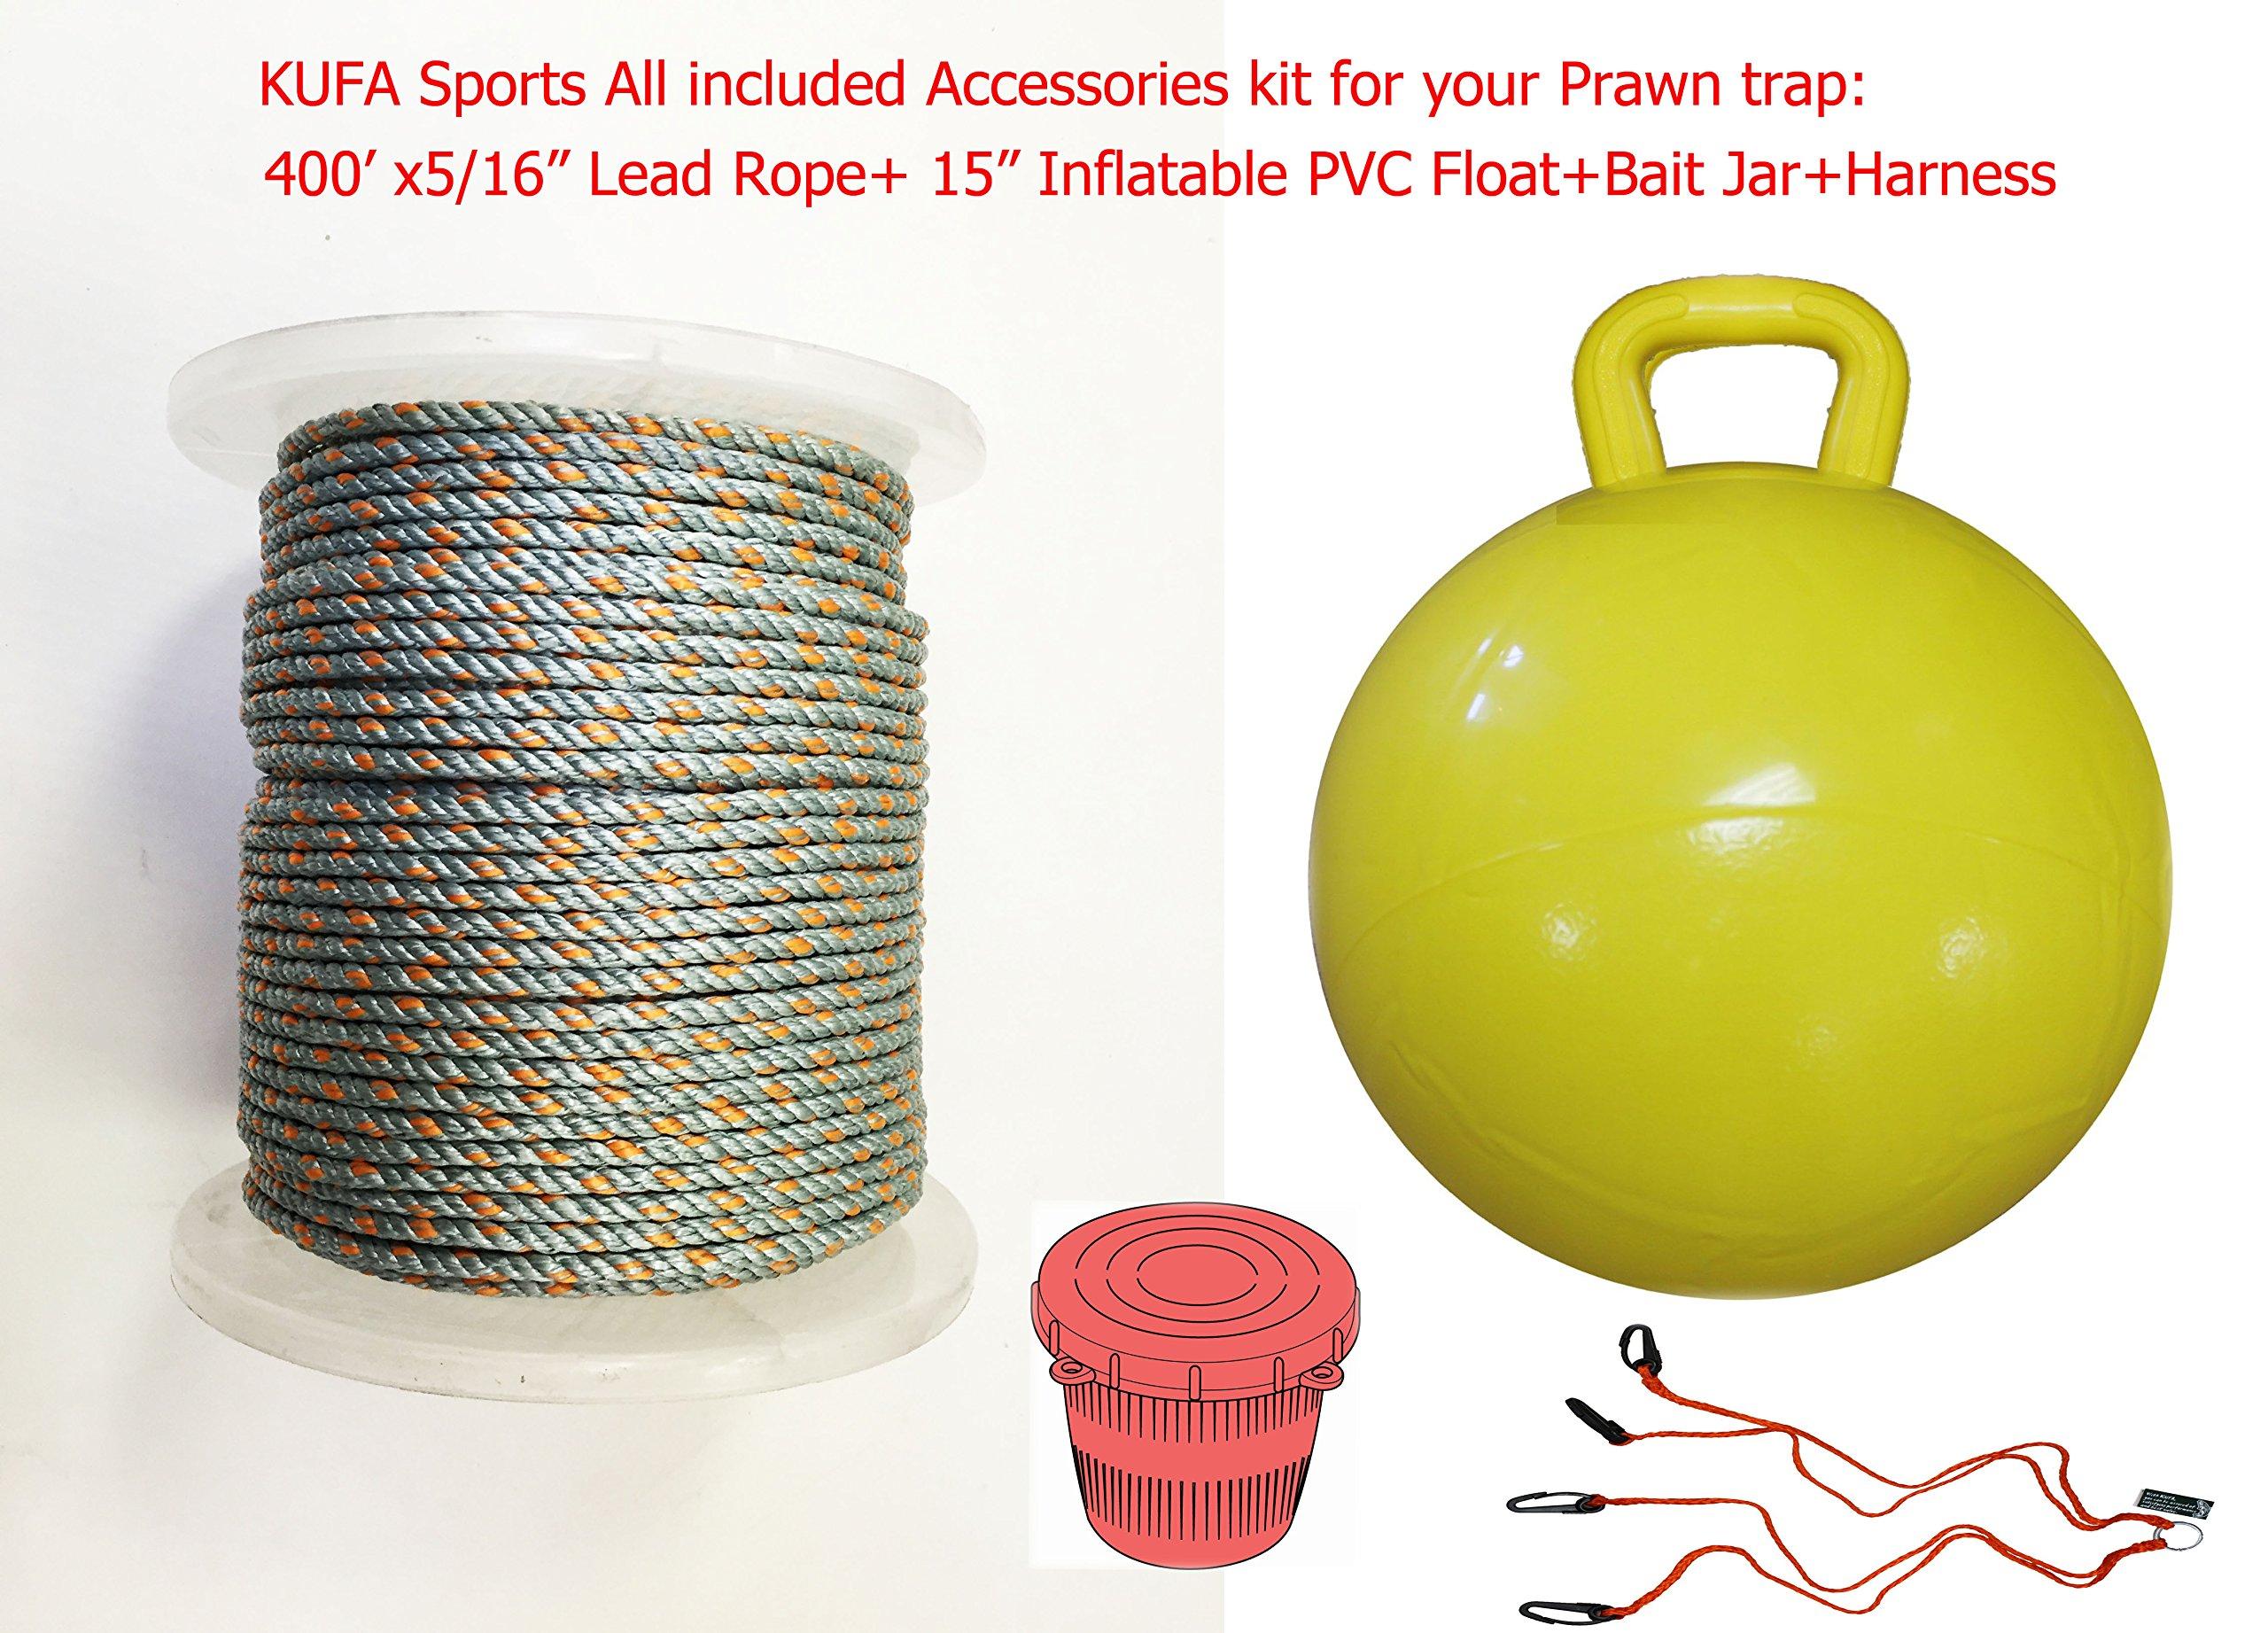 KUFA Sports All Included Prawn Trap Accessories/(5/16'' x 400'' Lead Core Rope)/15'' Float/Bait Jar/Harness Combo by KUFA Sports